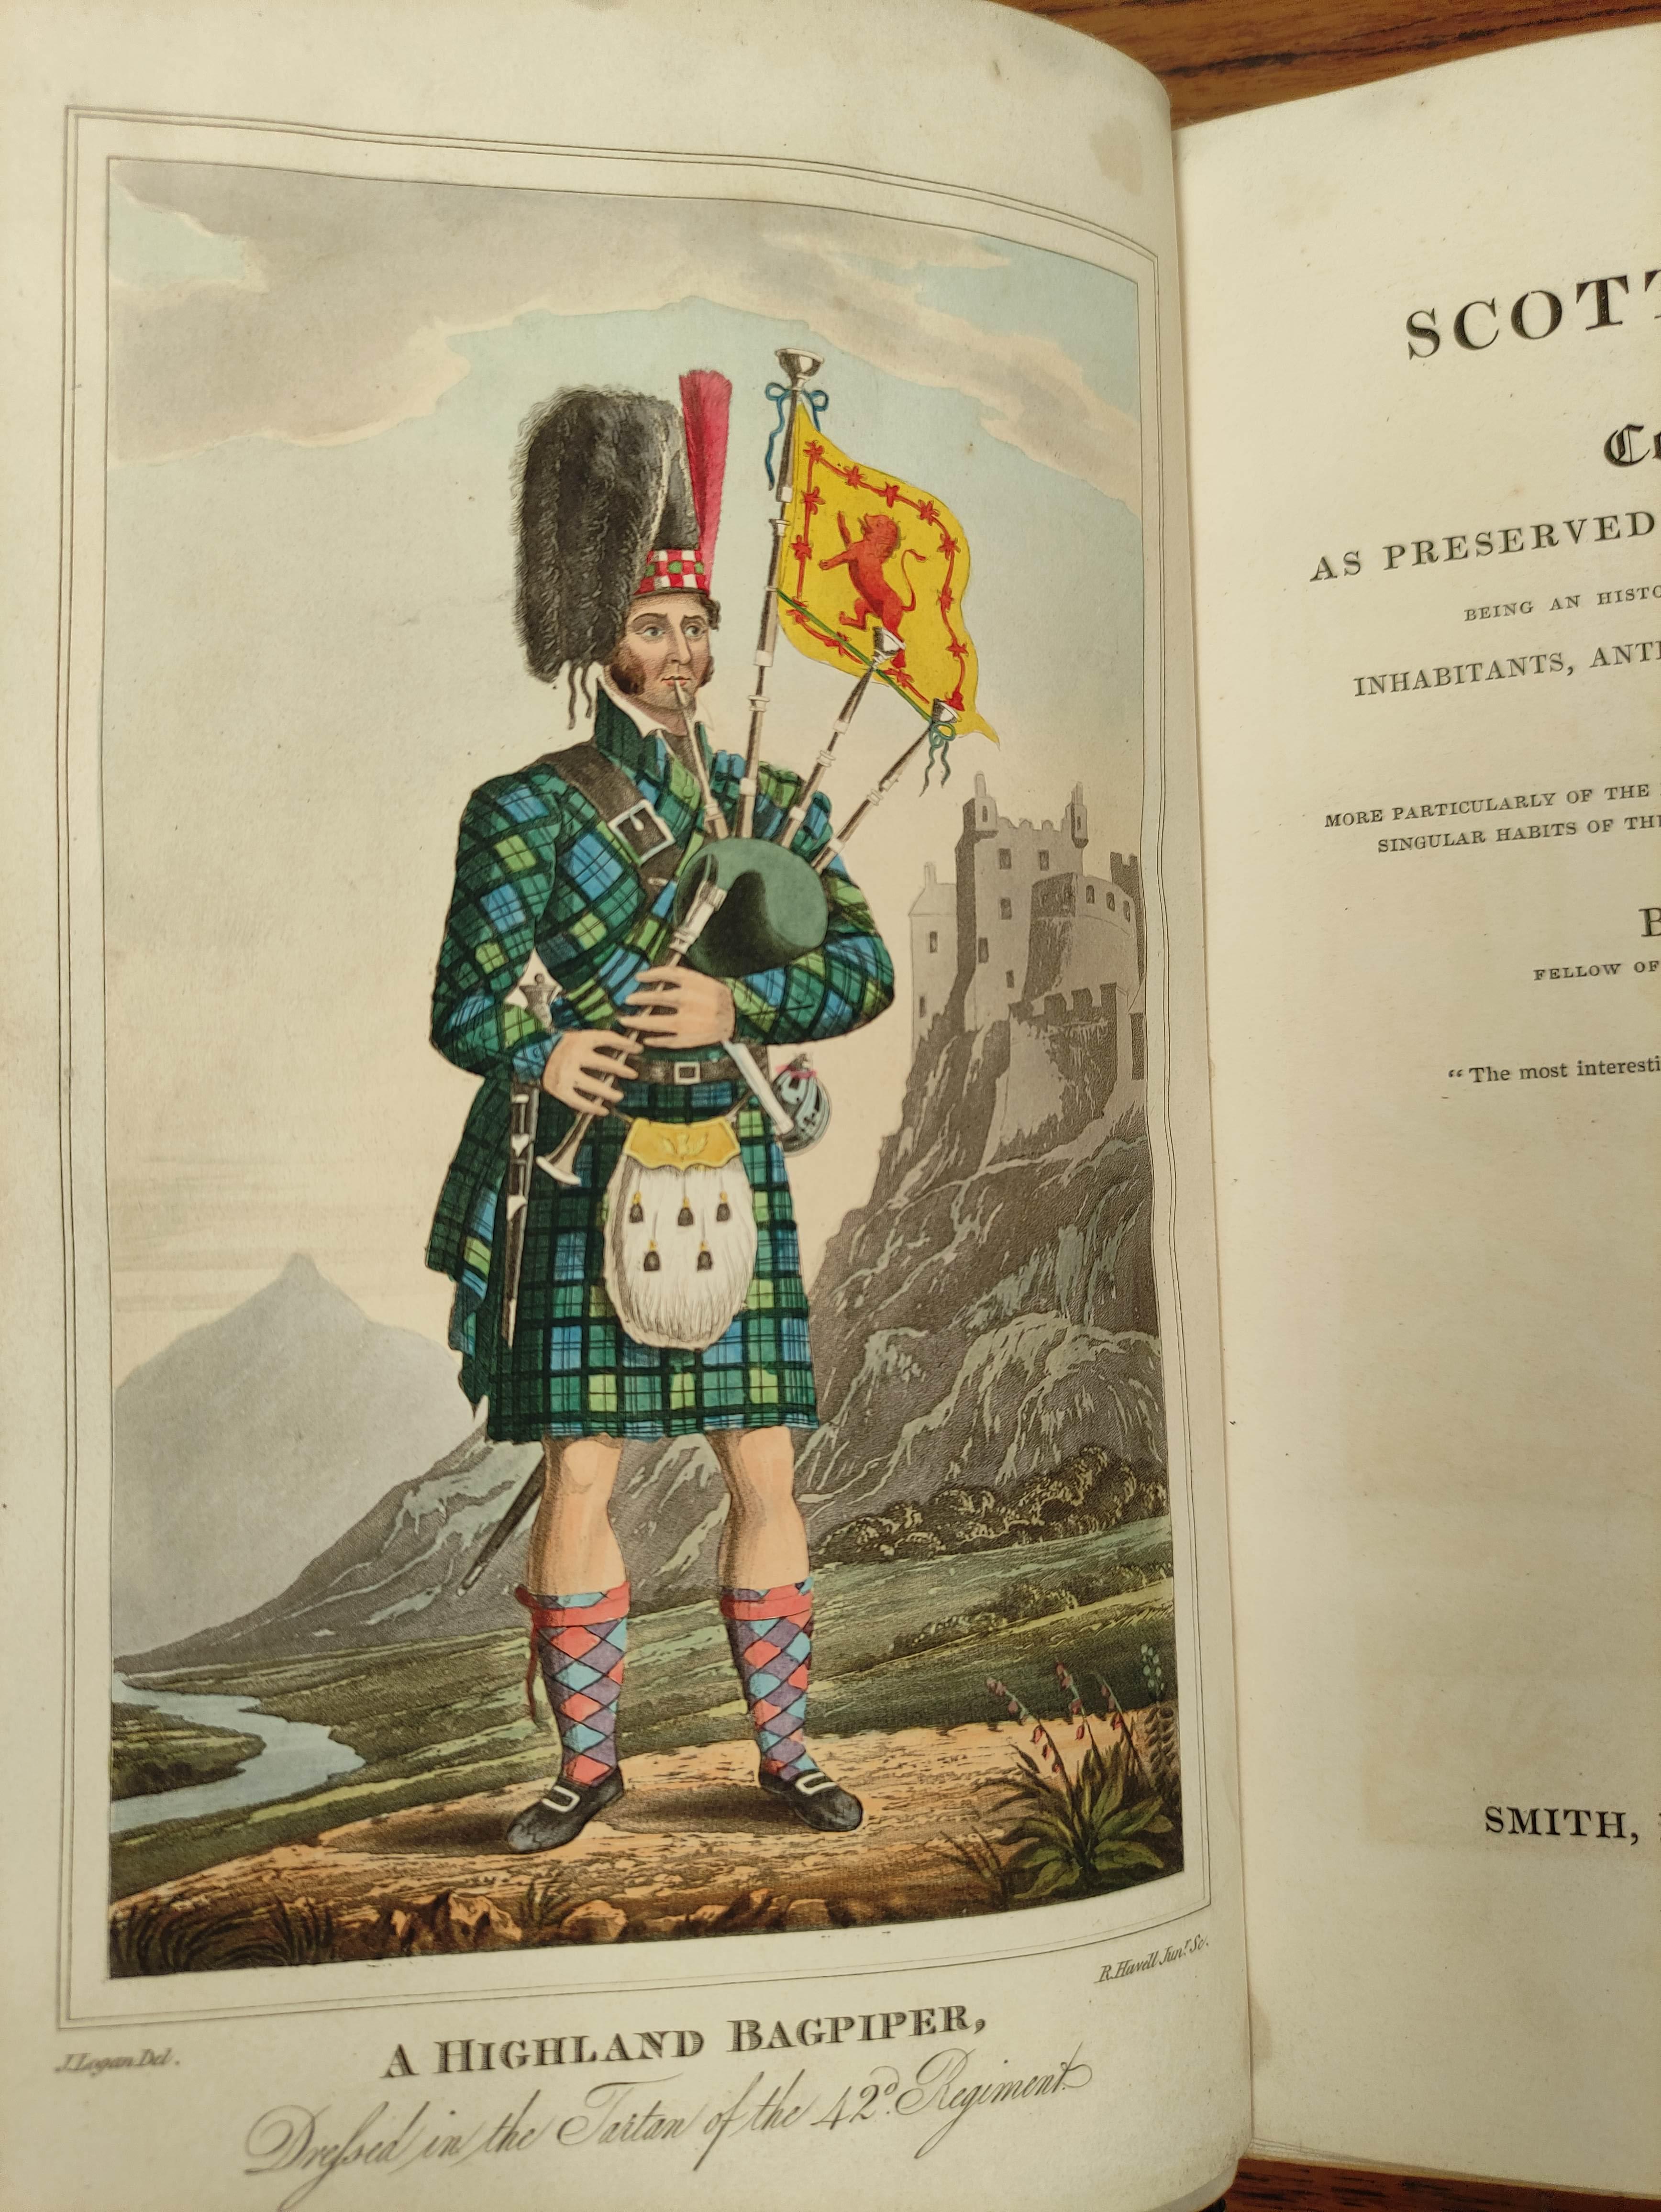 LOGAN JAMES.The Scottish Gael. 2 vols. Col. frontis & text illus. Half green morocco. A nice - Image 9 of 10